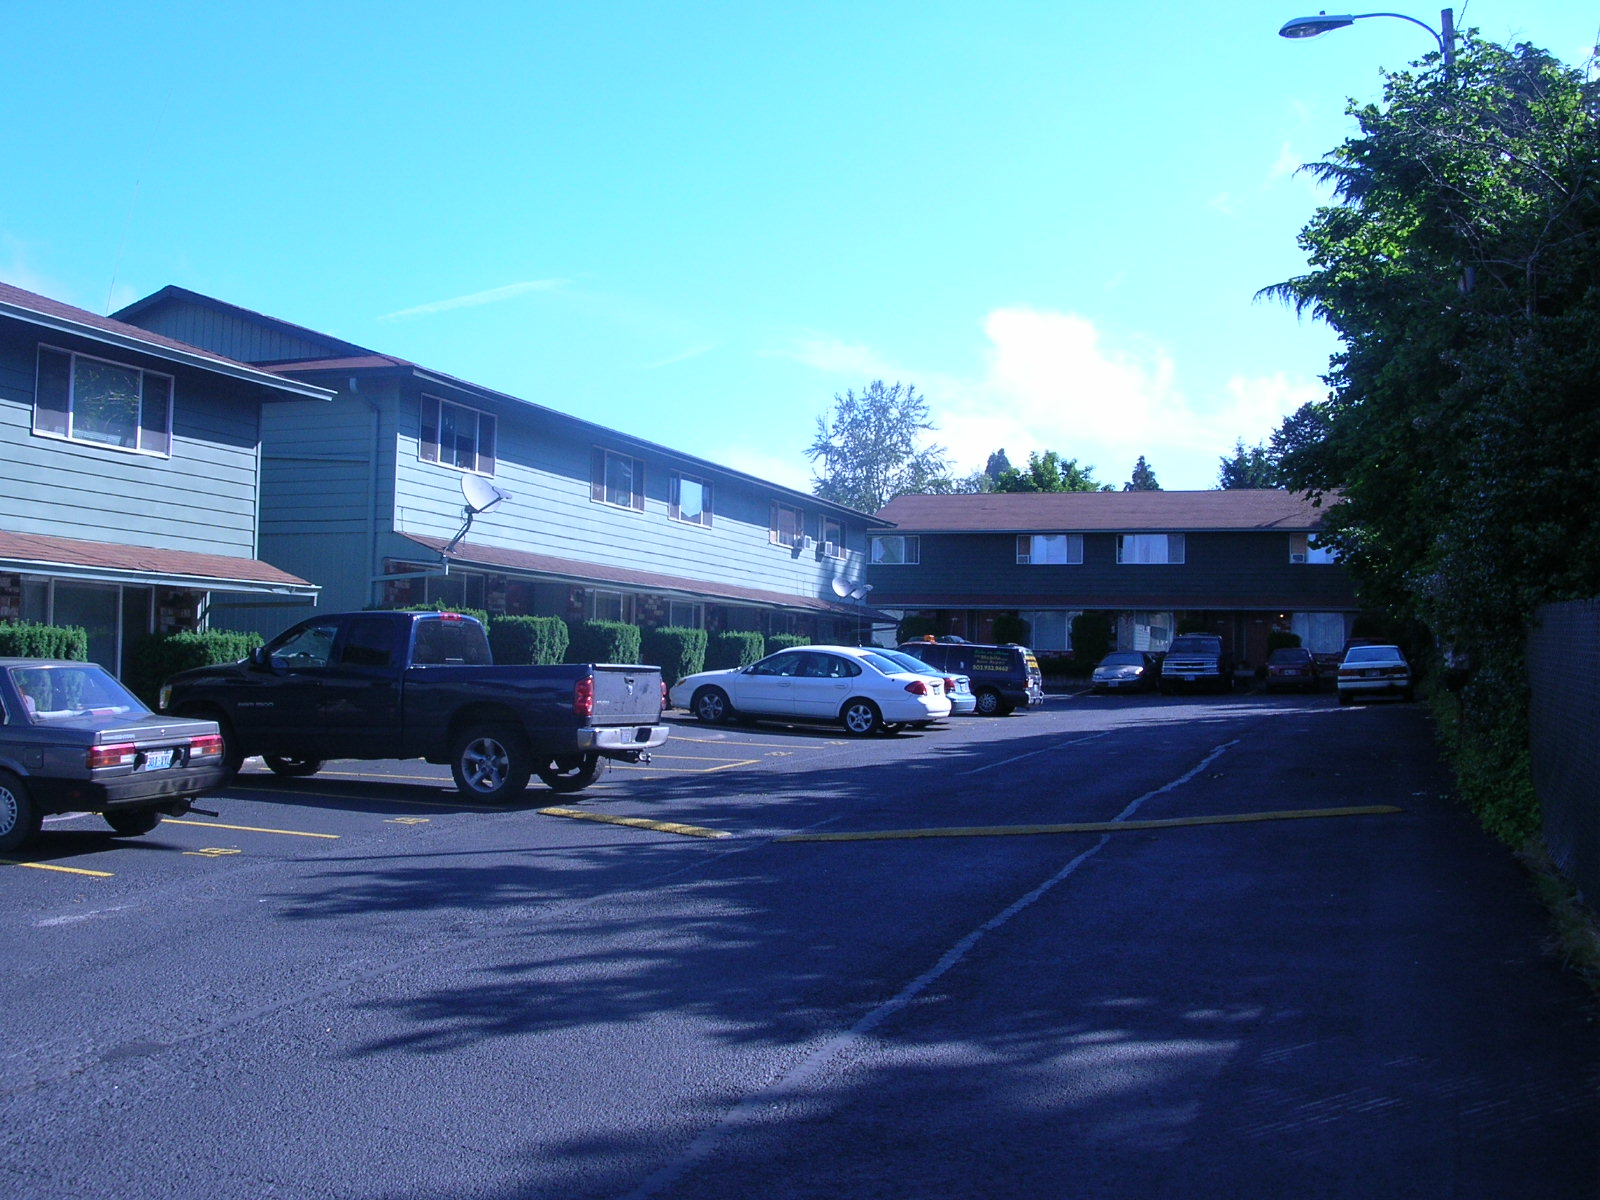 Marquis Meadows Apartments